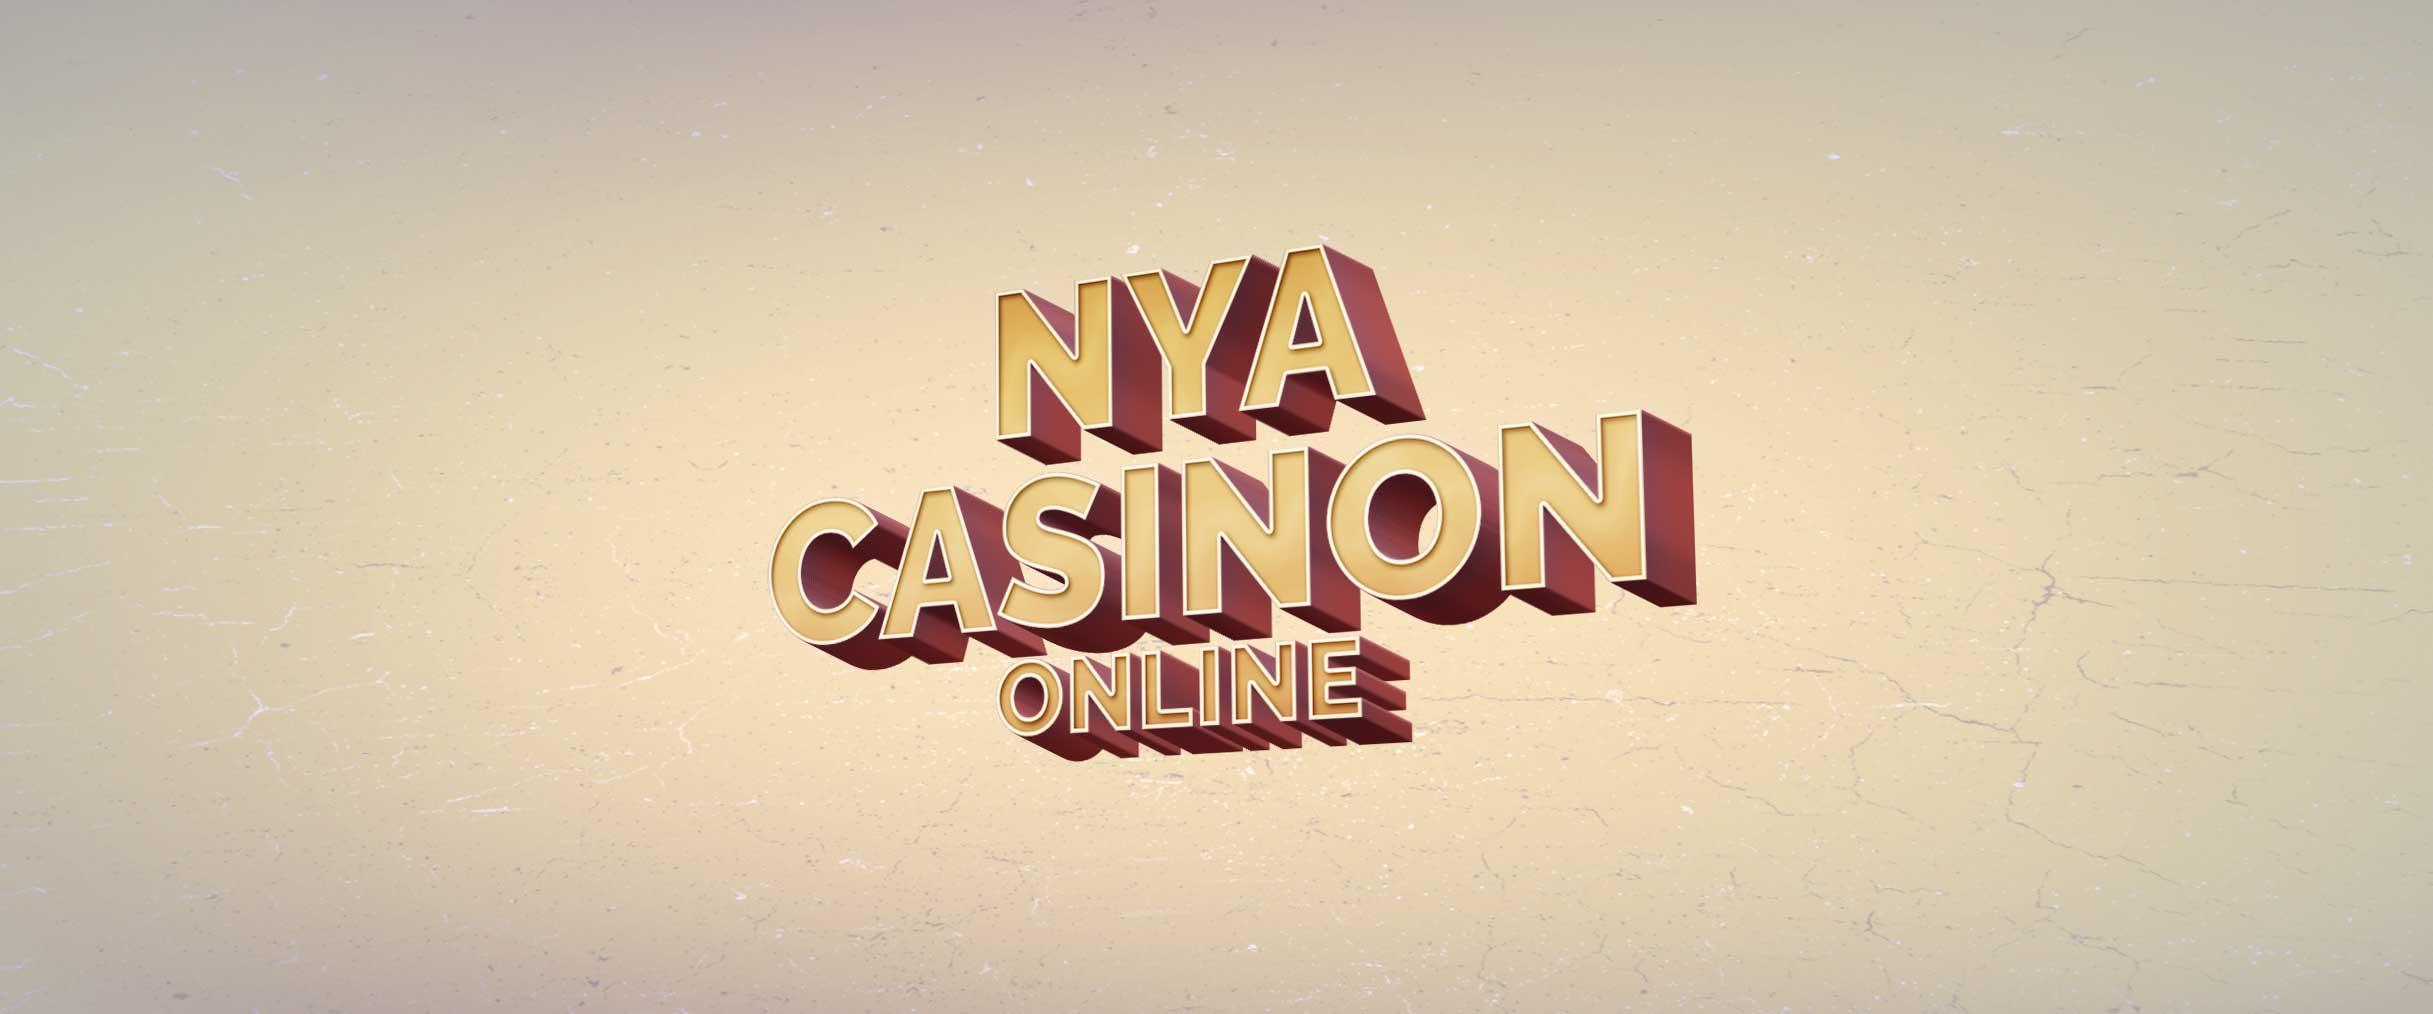 kasino online baru